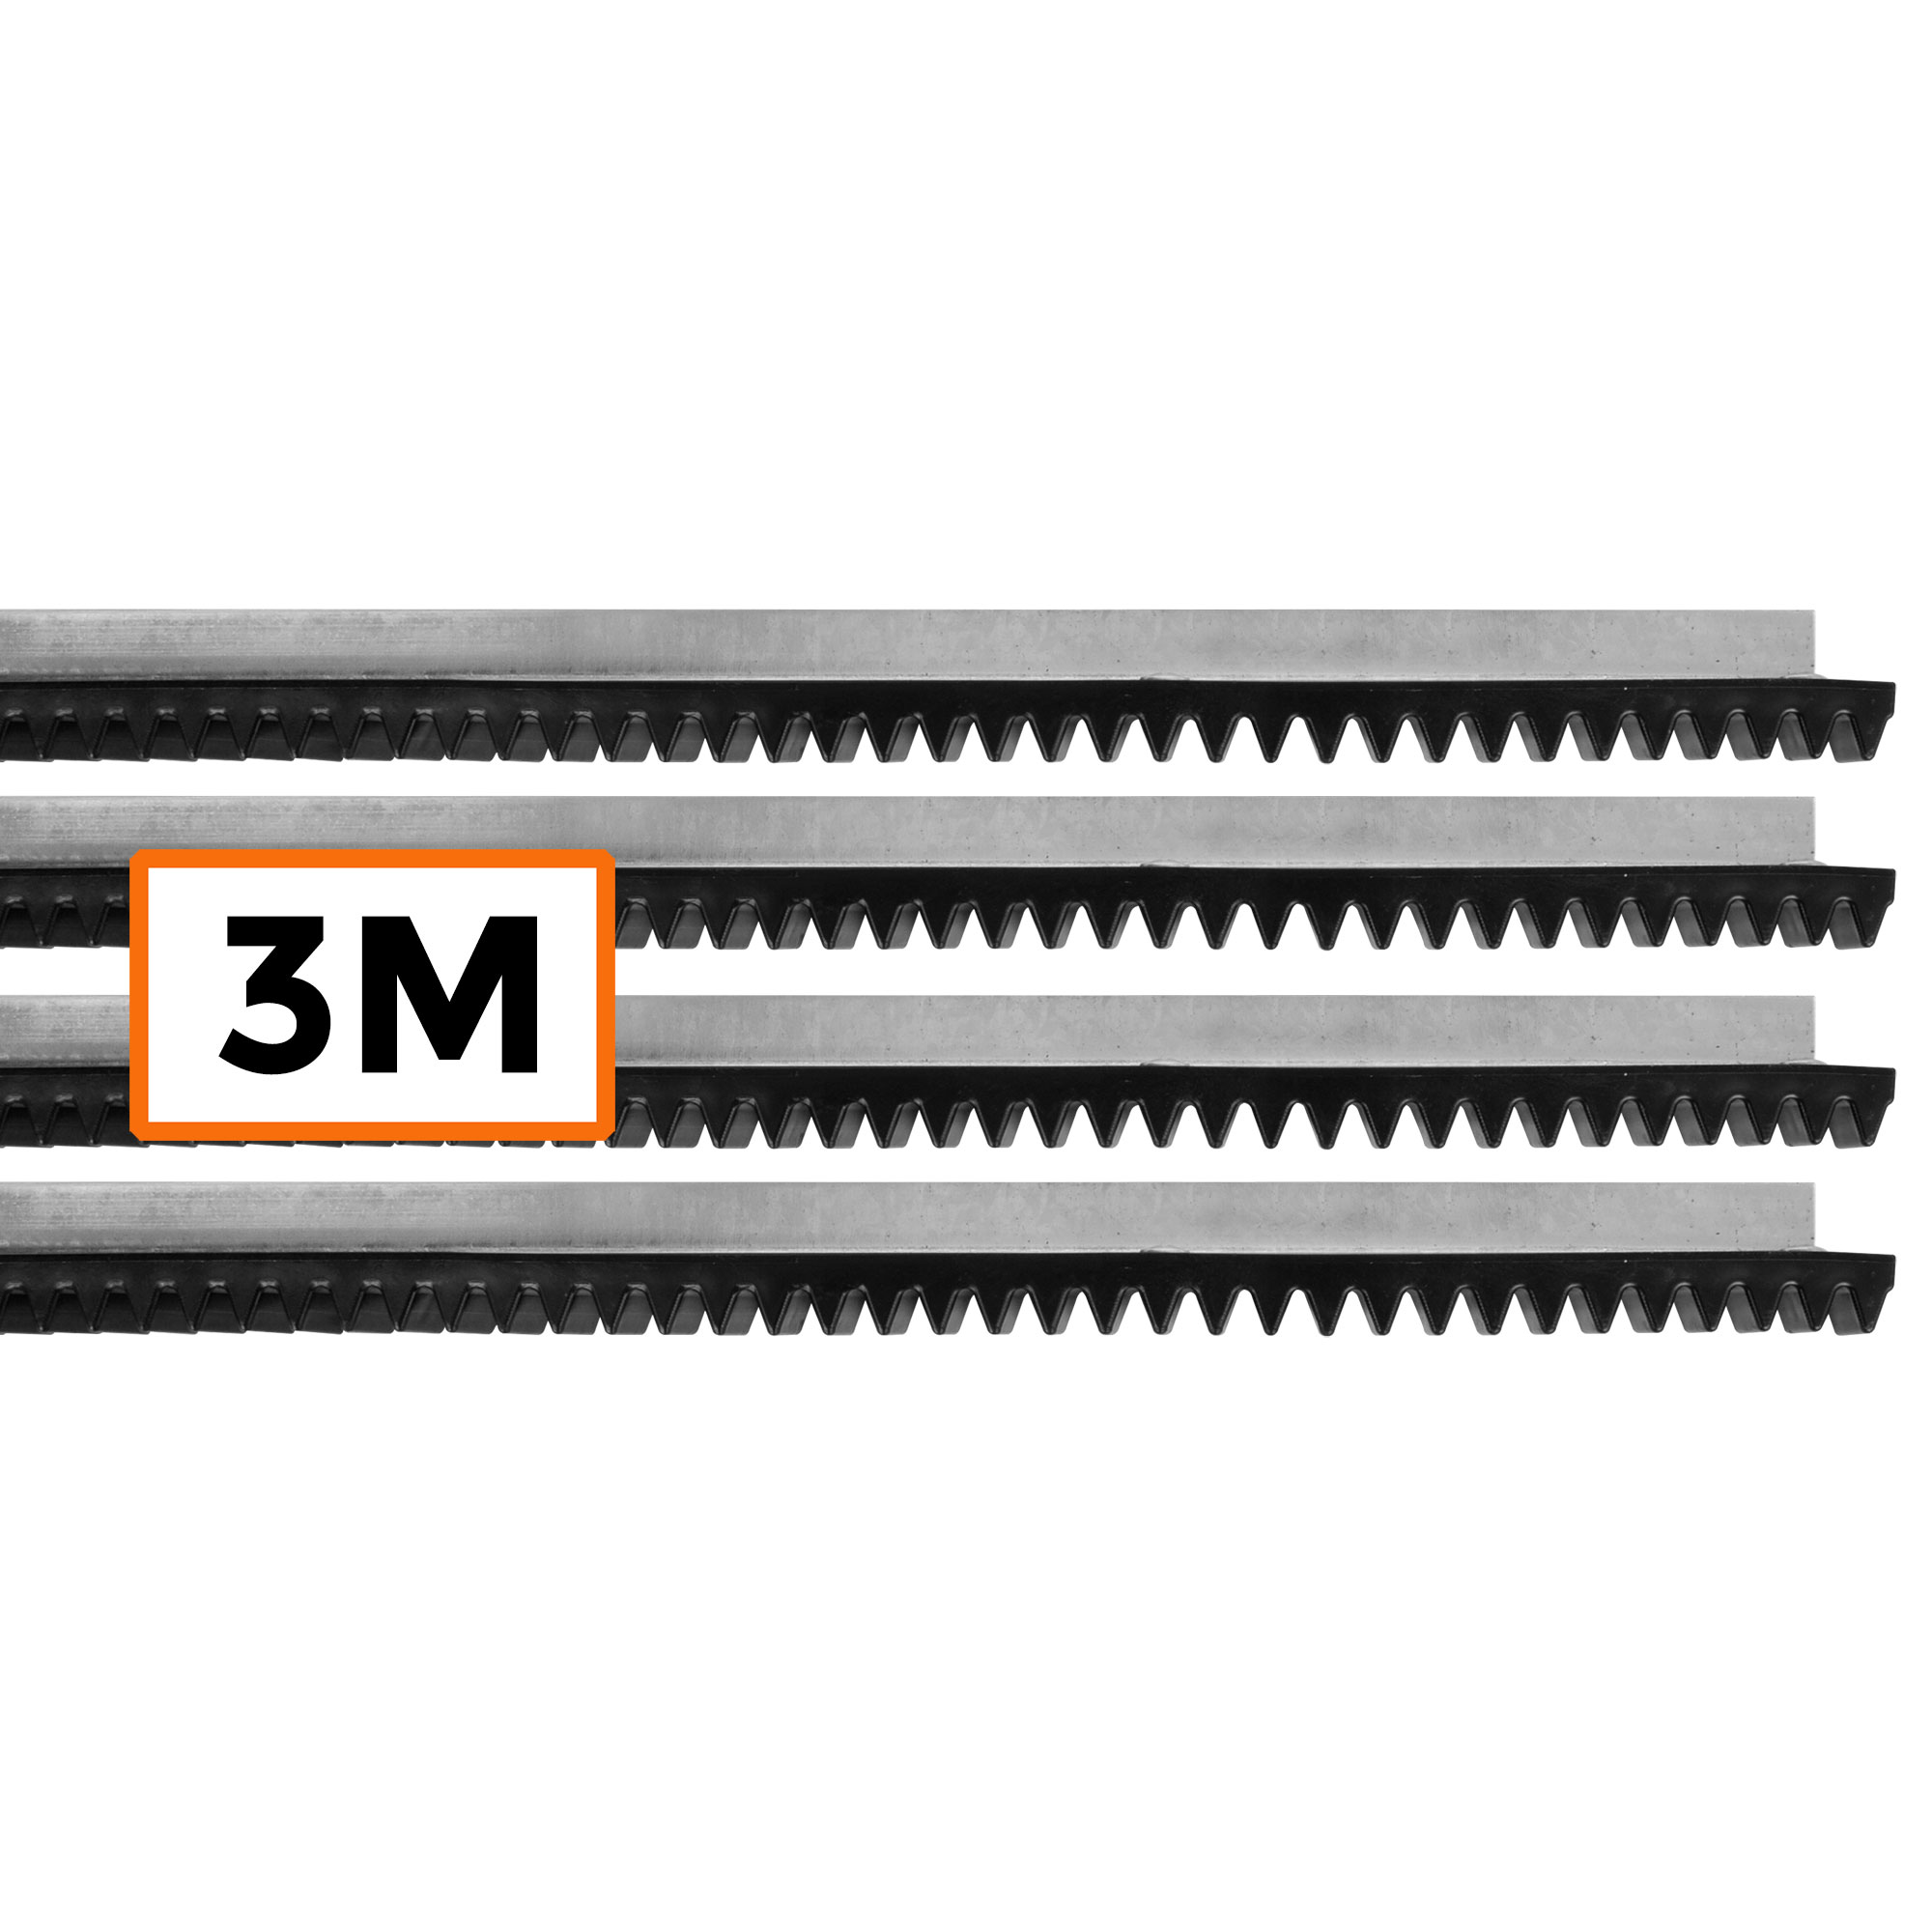 Kit 3 Metros Cremalheira Residencial Deslizante Motor Portão Universal